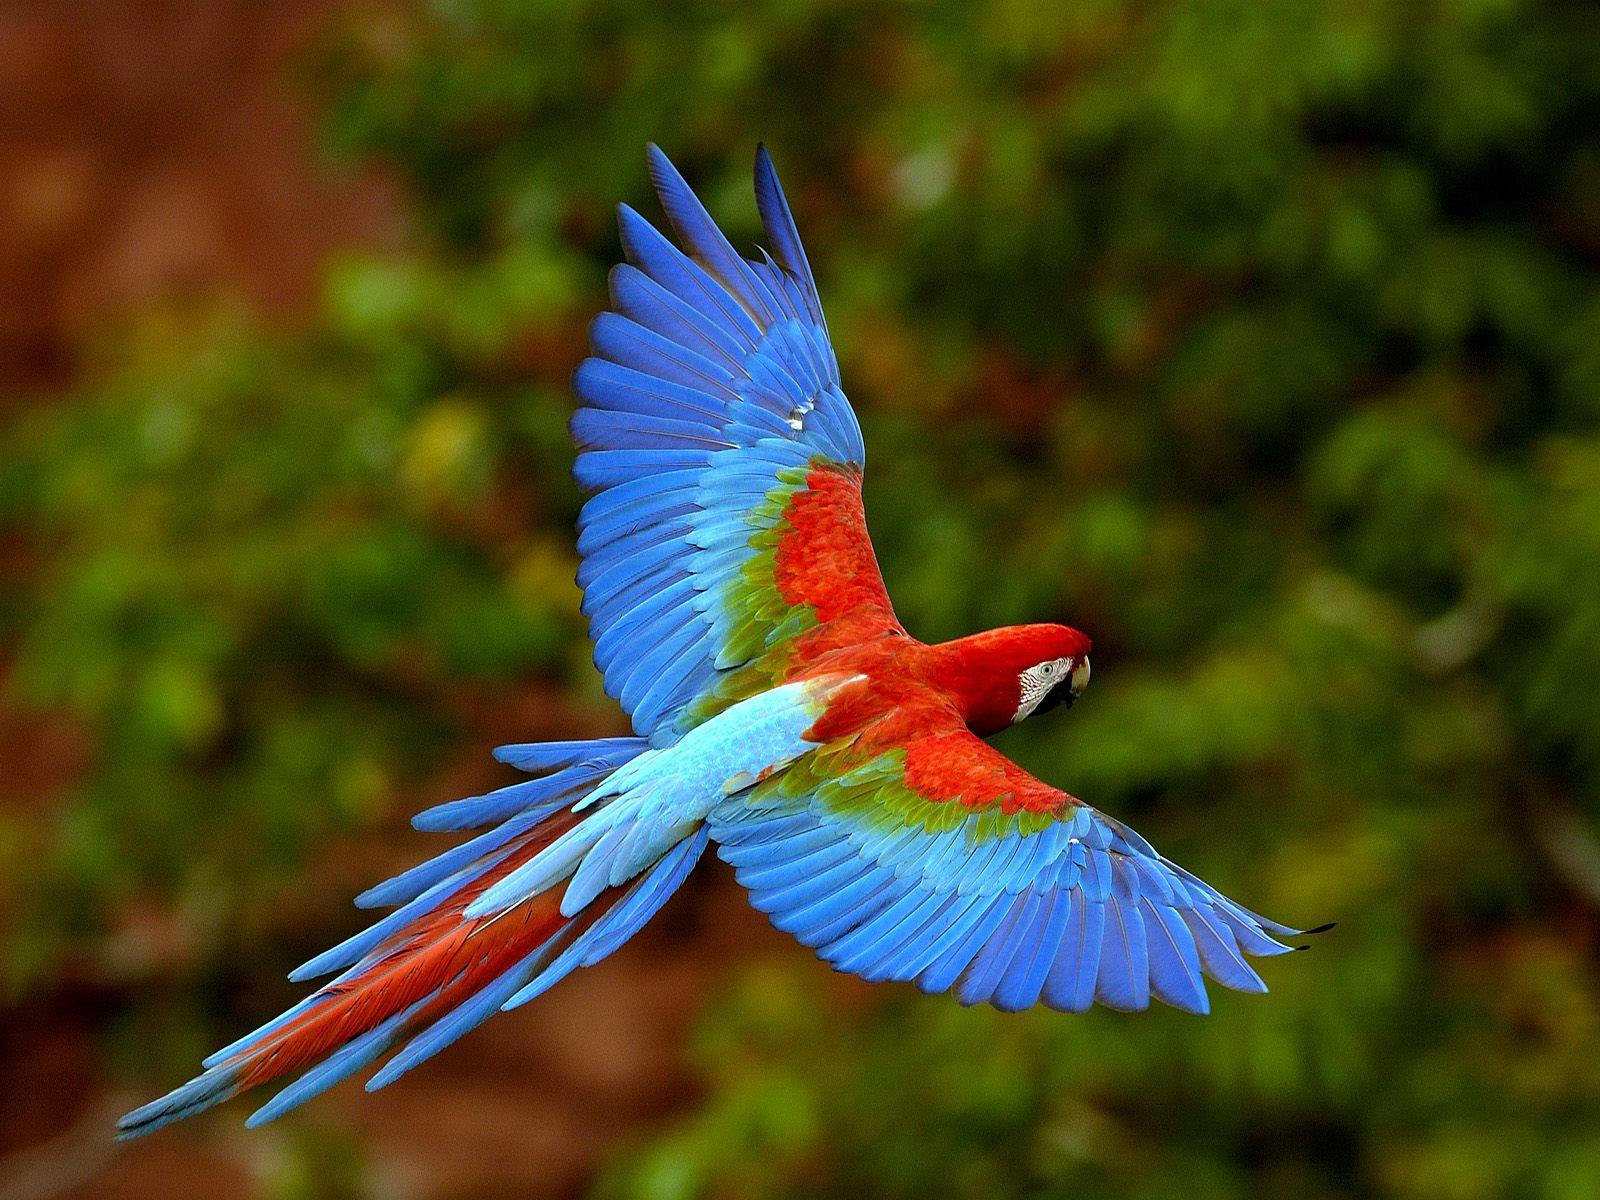 parrots wallpaper bird - photo #20